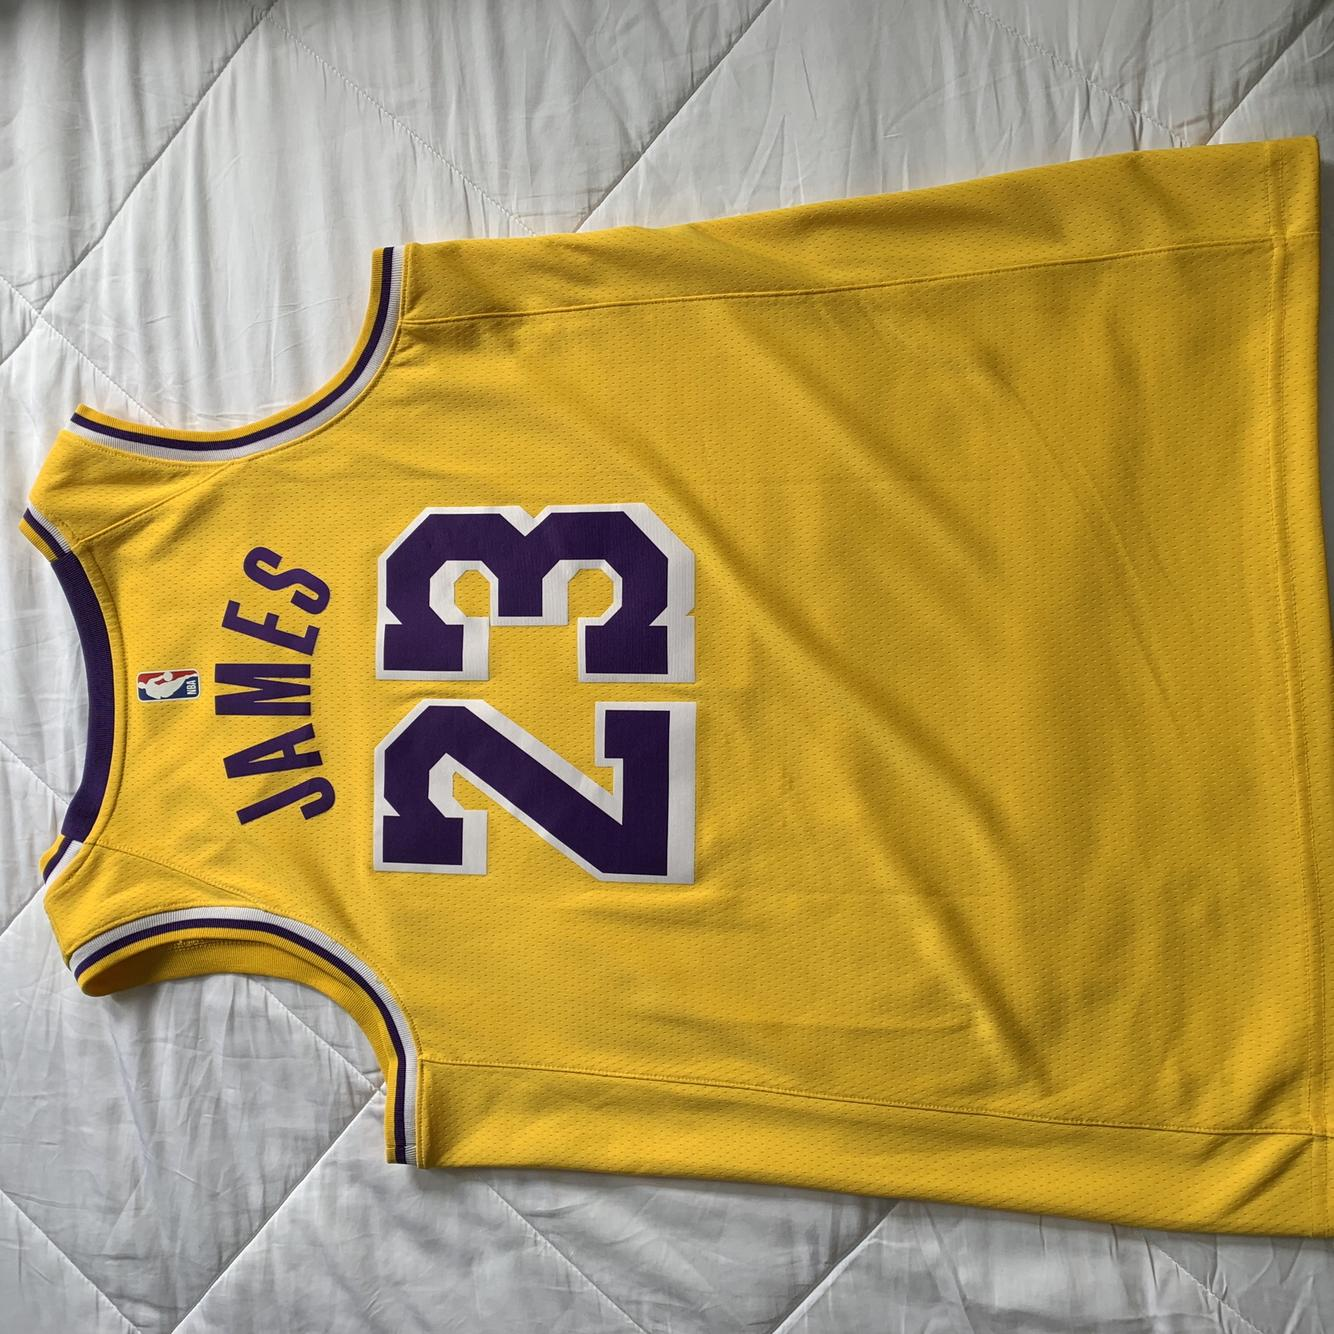 Lebron James Nike Swingman Lakers Jersey (Large)